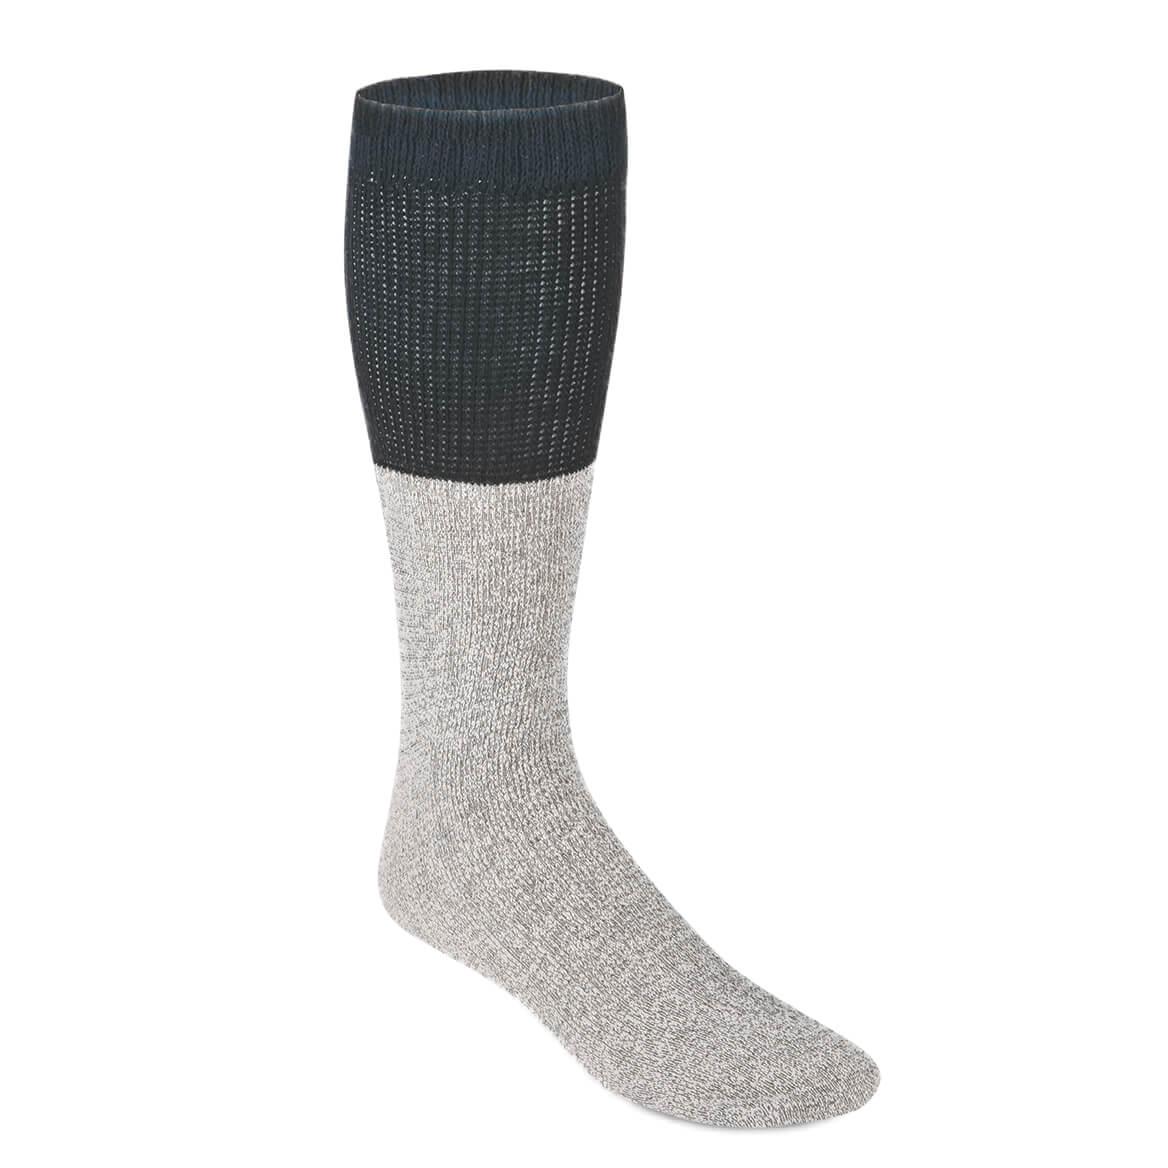 Thermal Diabetic Socks S/3-369925